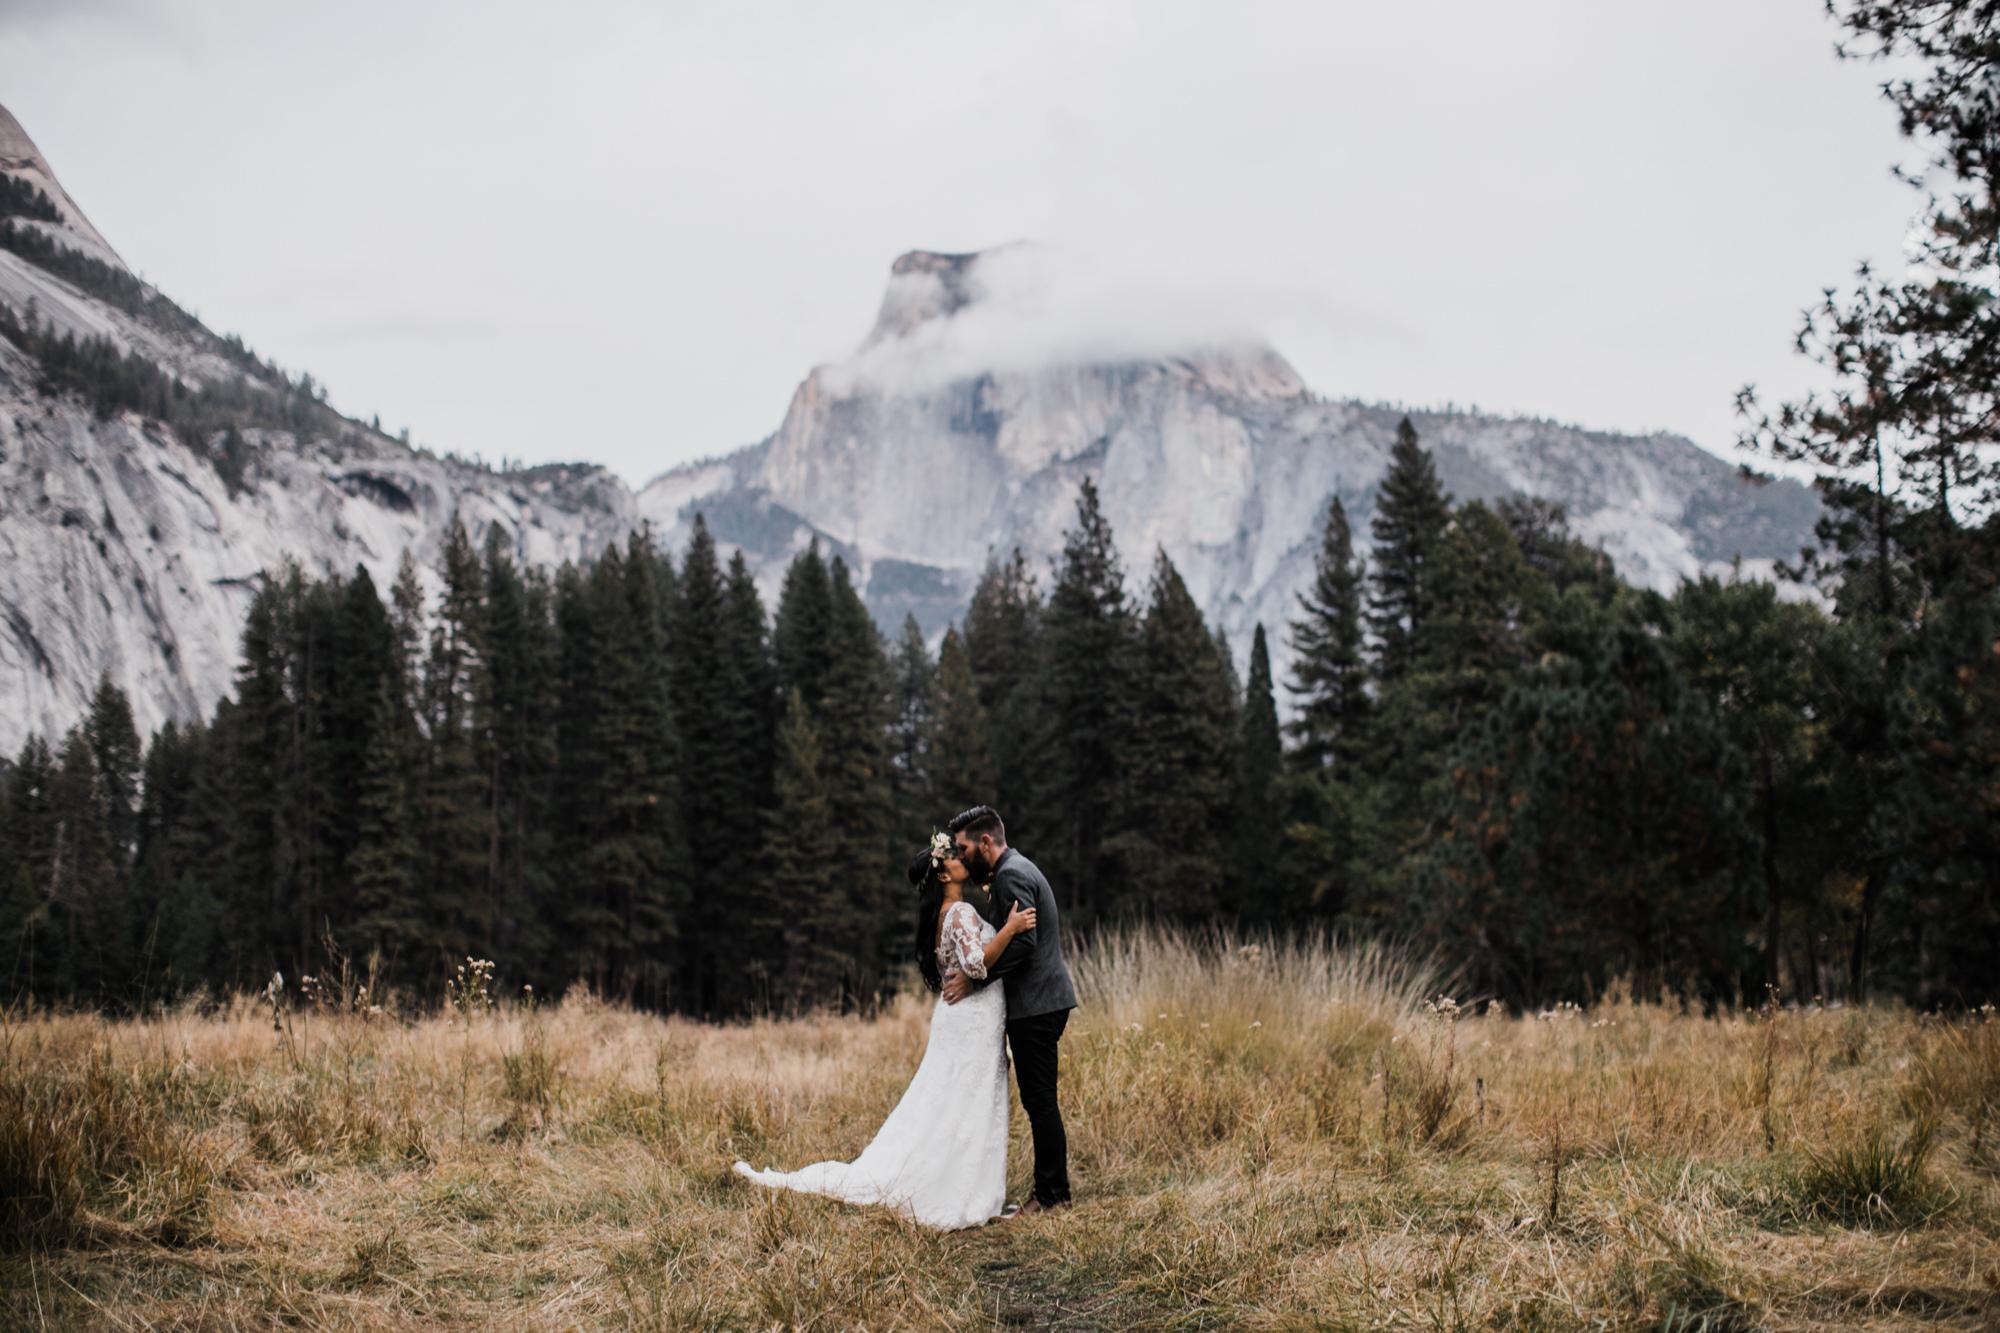 fall wedding in yosemite national park | destination adventure wedding photographers | the hearnes adventure photography | www.thehearnes.com